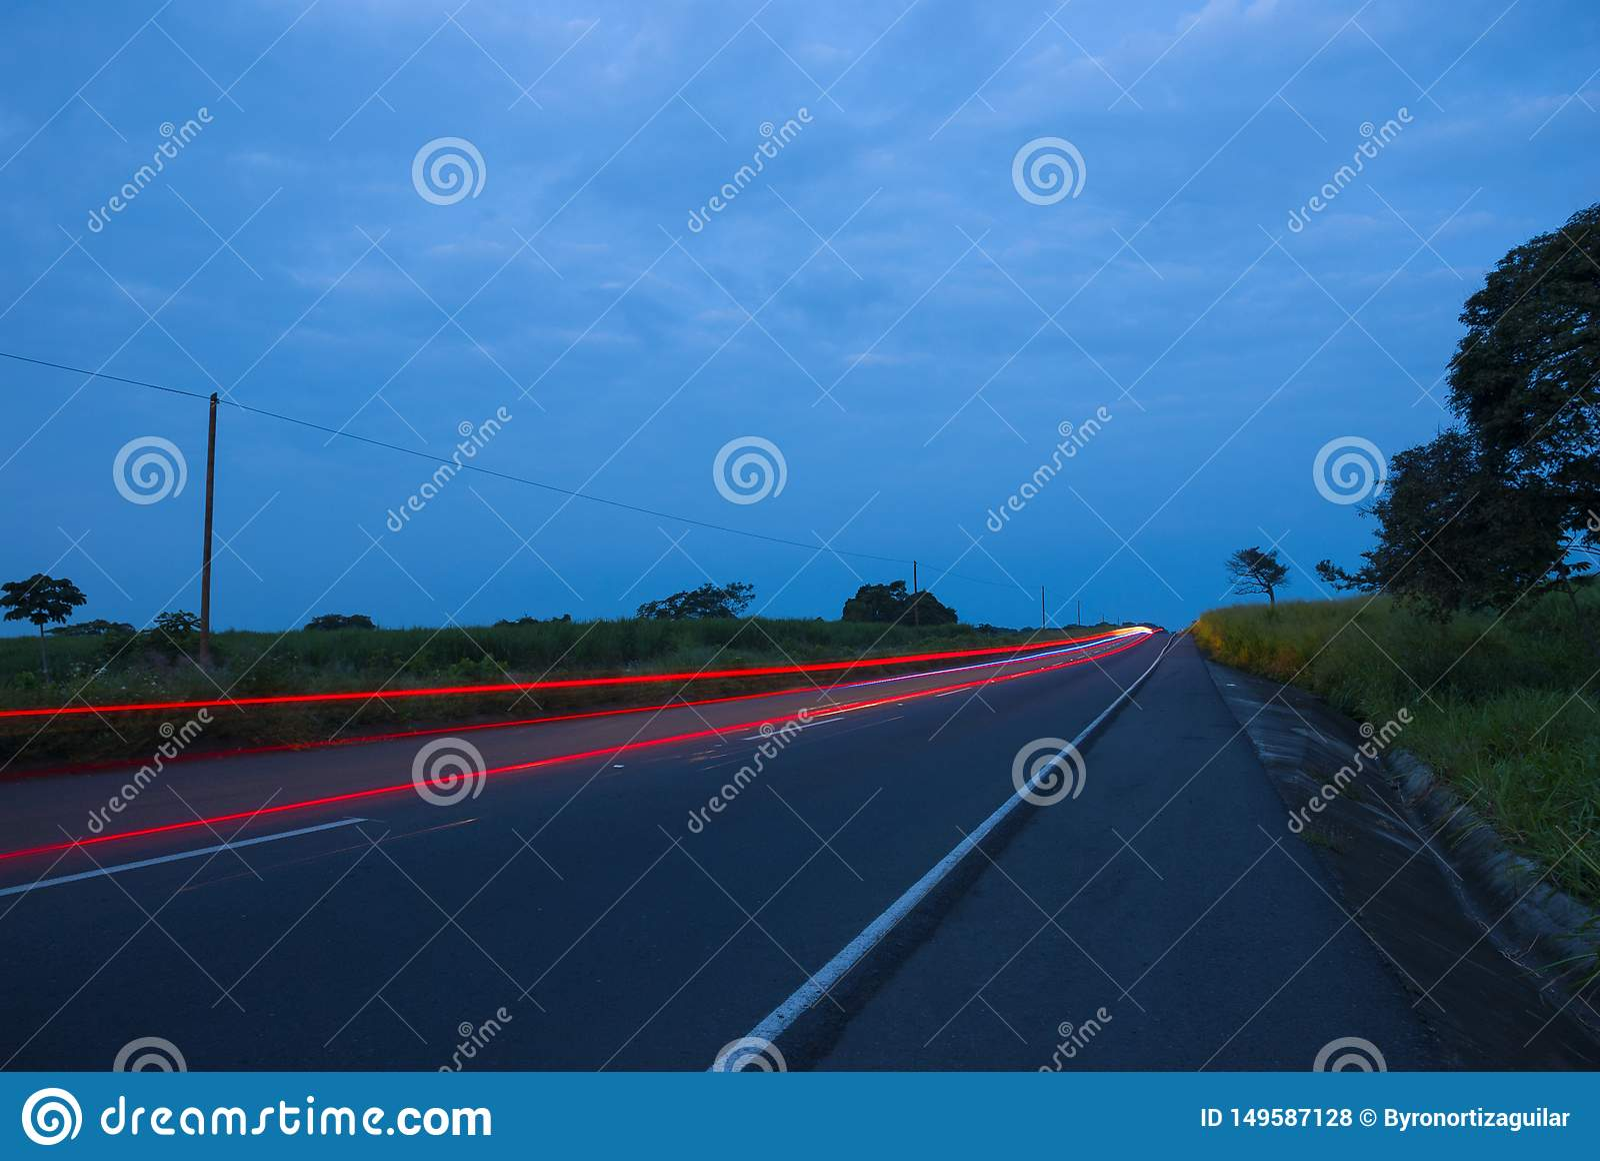 Autos speedingon eine Landstra?e, Guatemala, Zentralamerika, Geschwindigkeitsauto